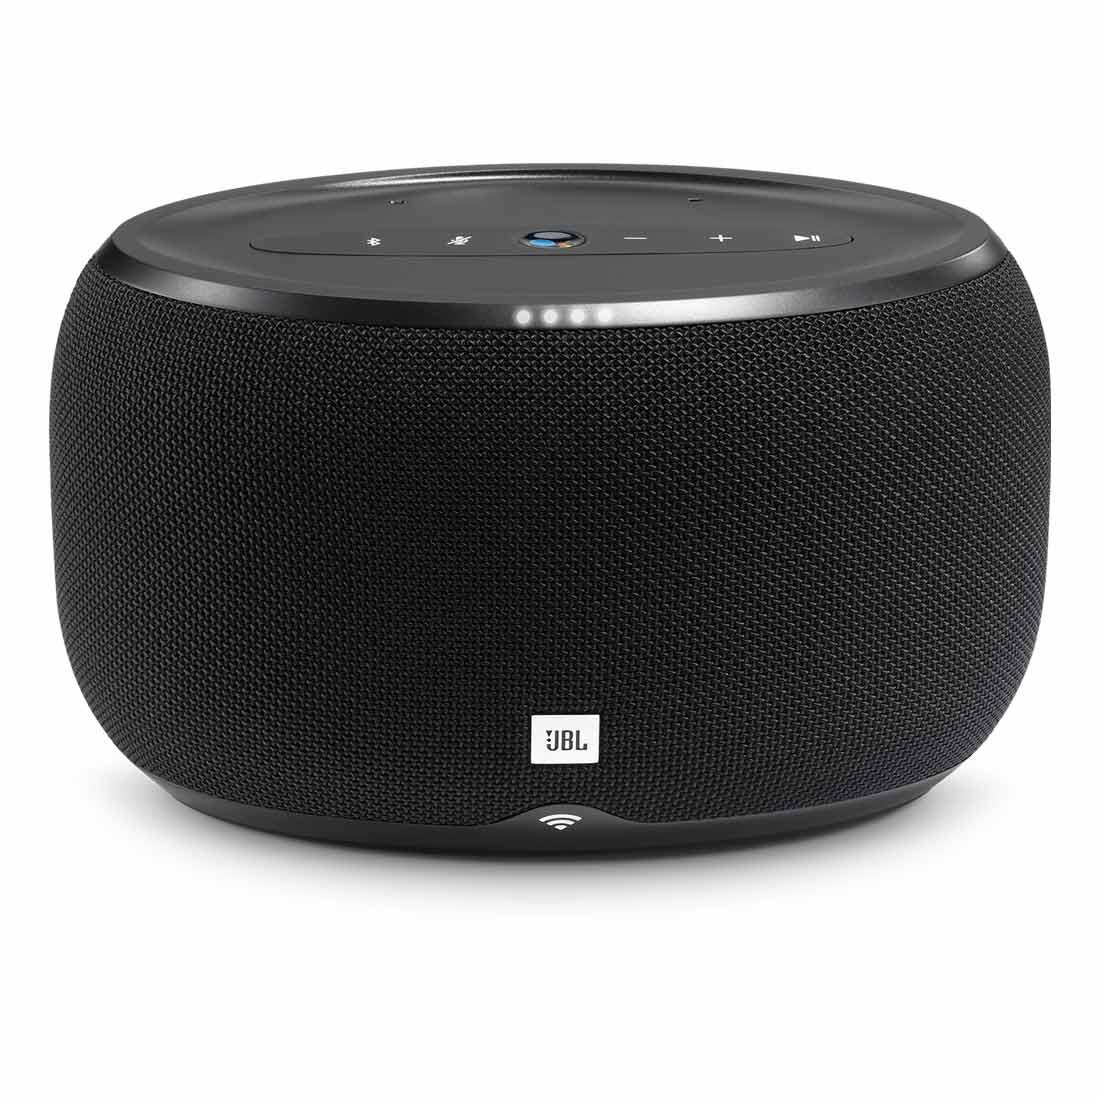 JBL Link 300 Voice Activated Wireless Speaker - Black